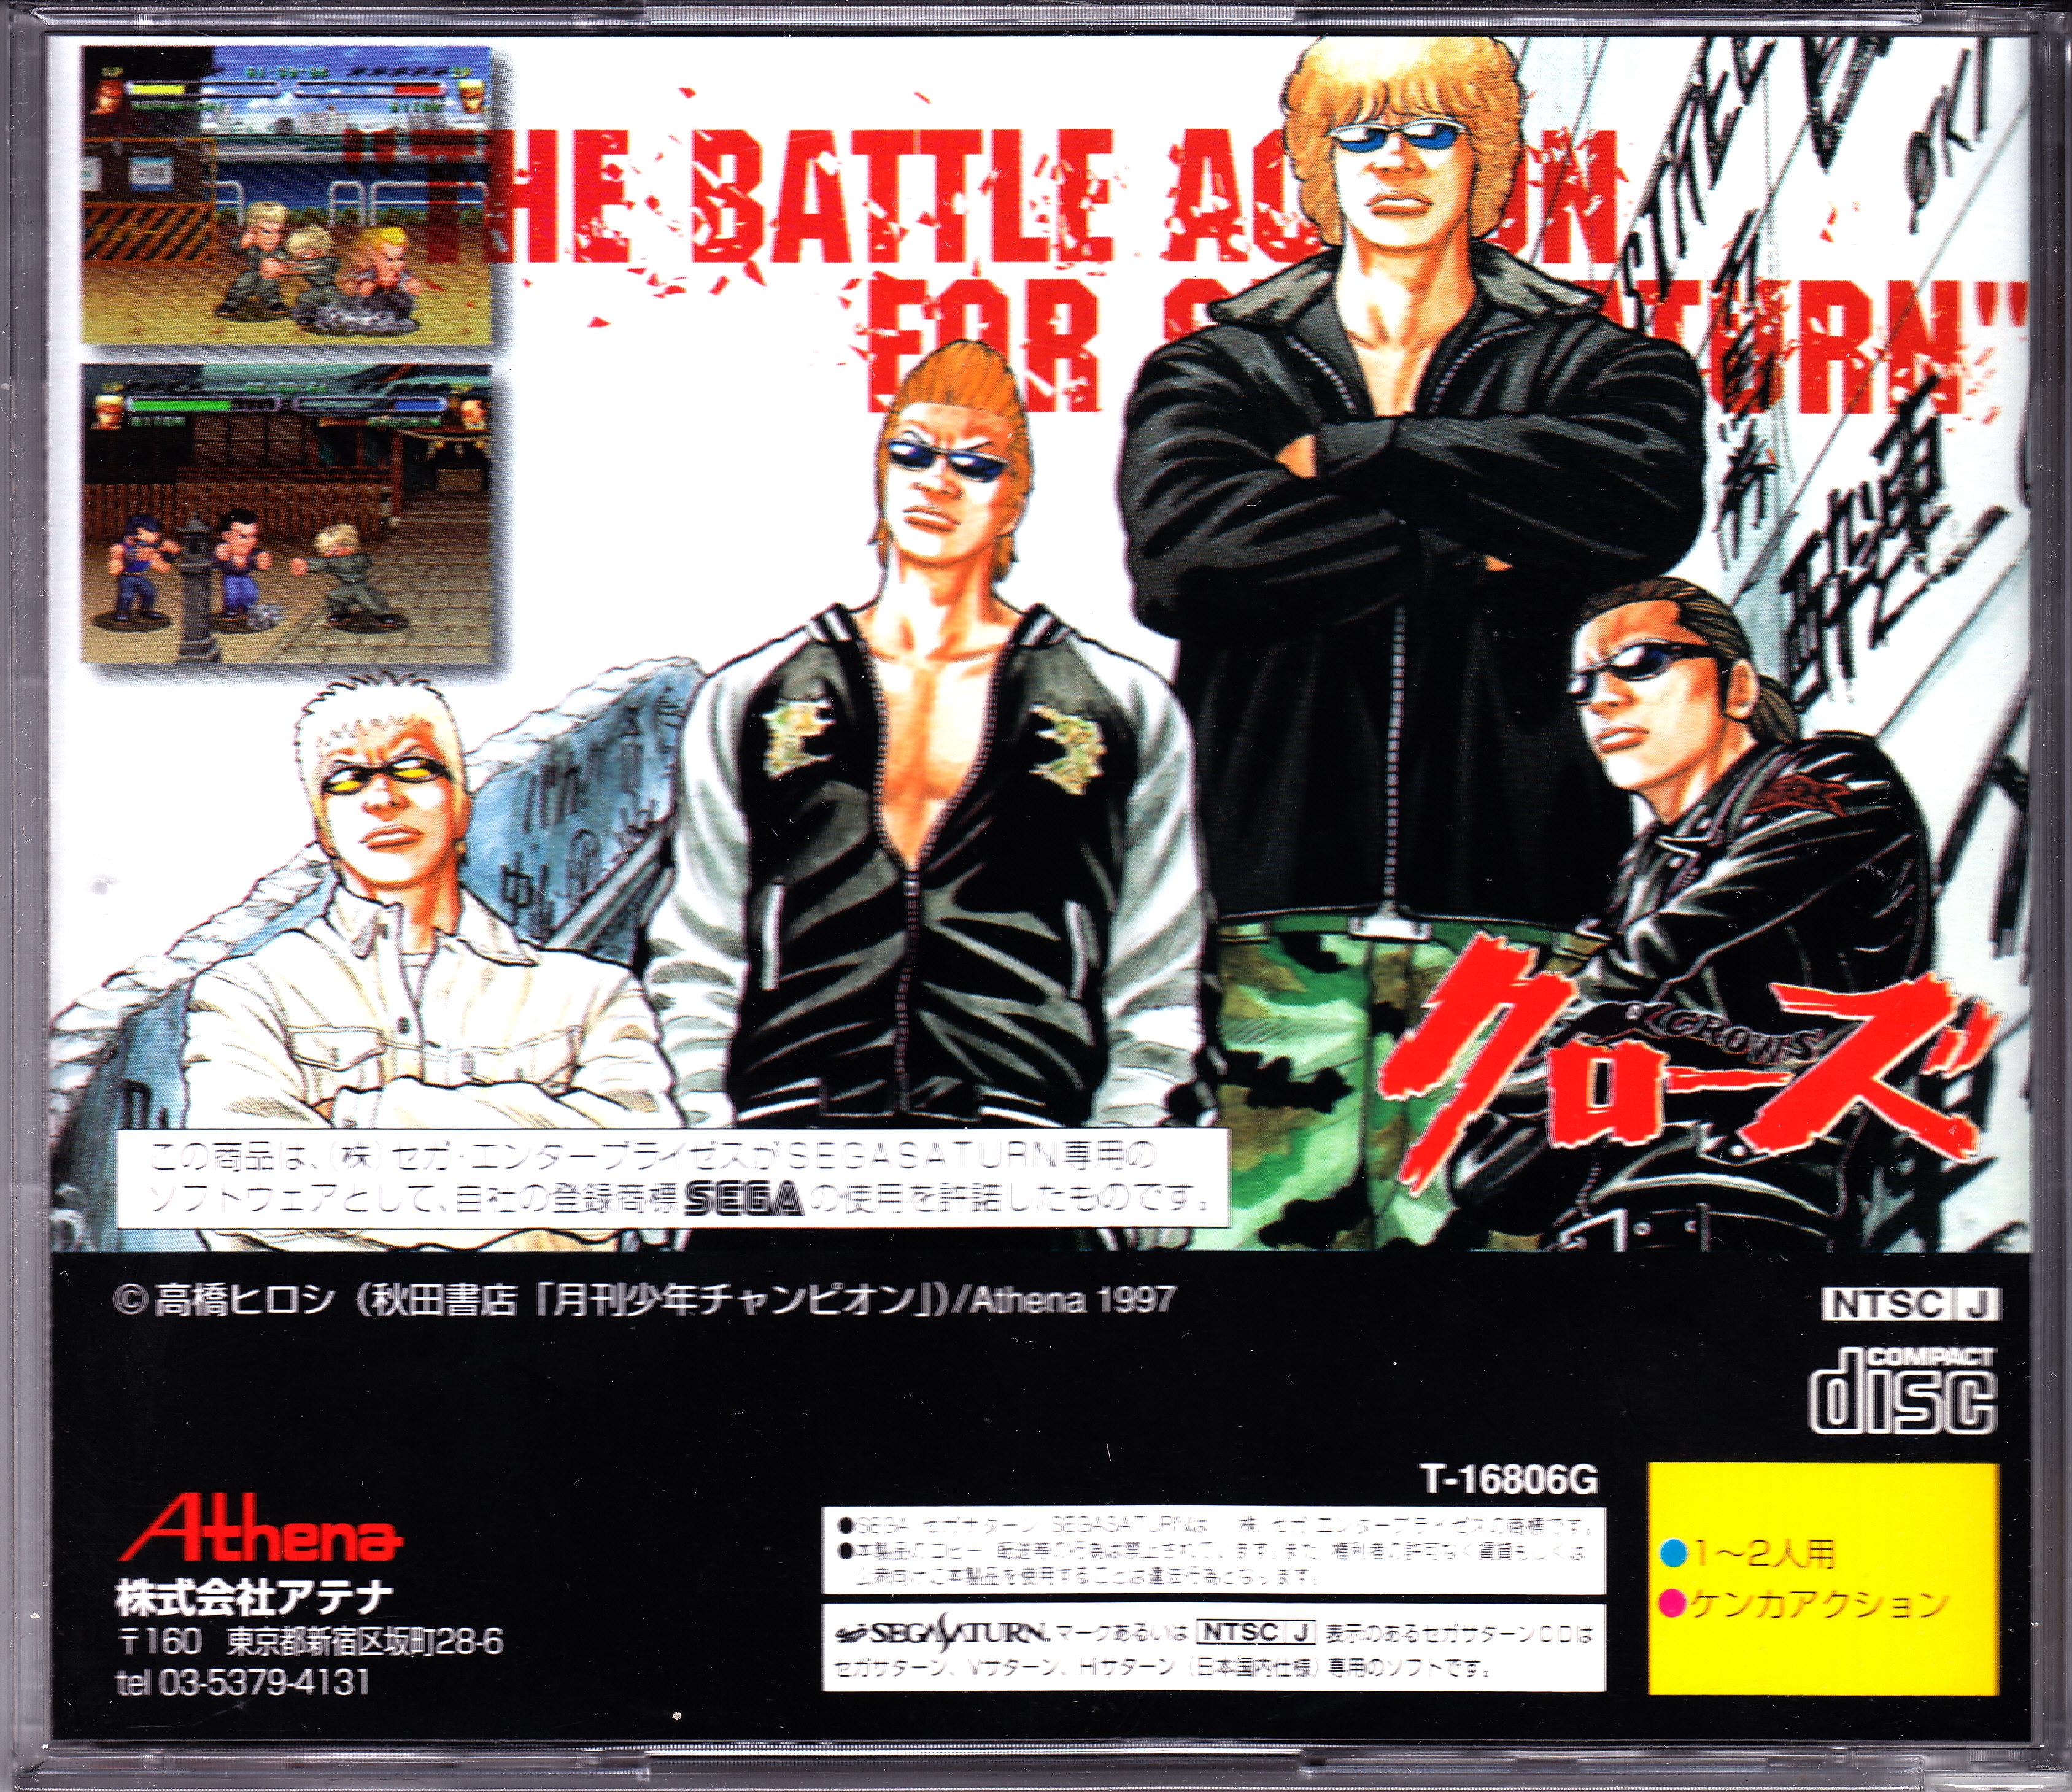 Sega Saturn Crows The Battle Action For Sega Saturn Back Cover.jpg